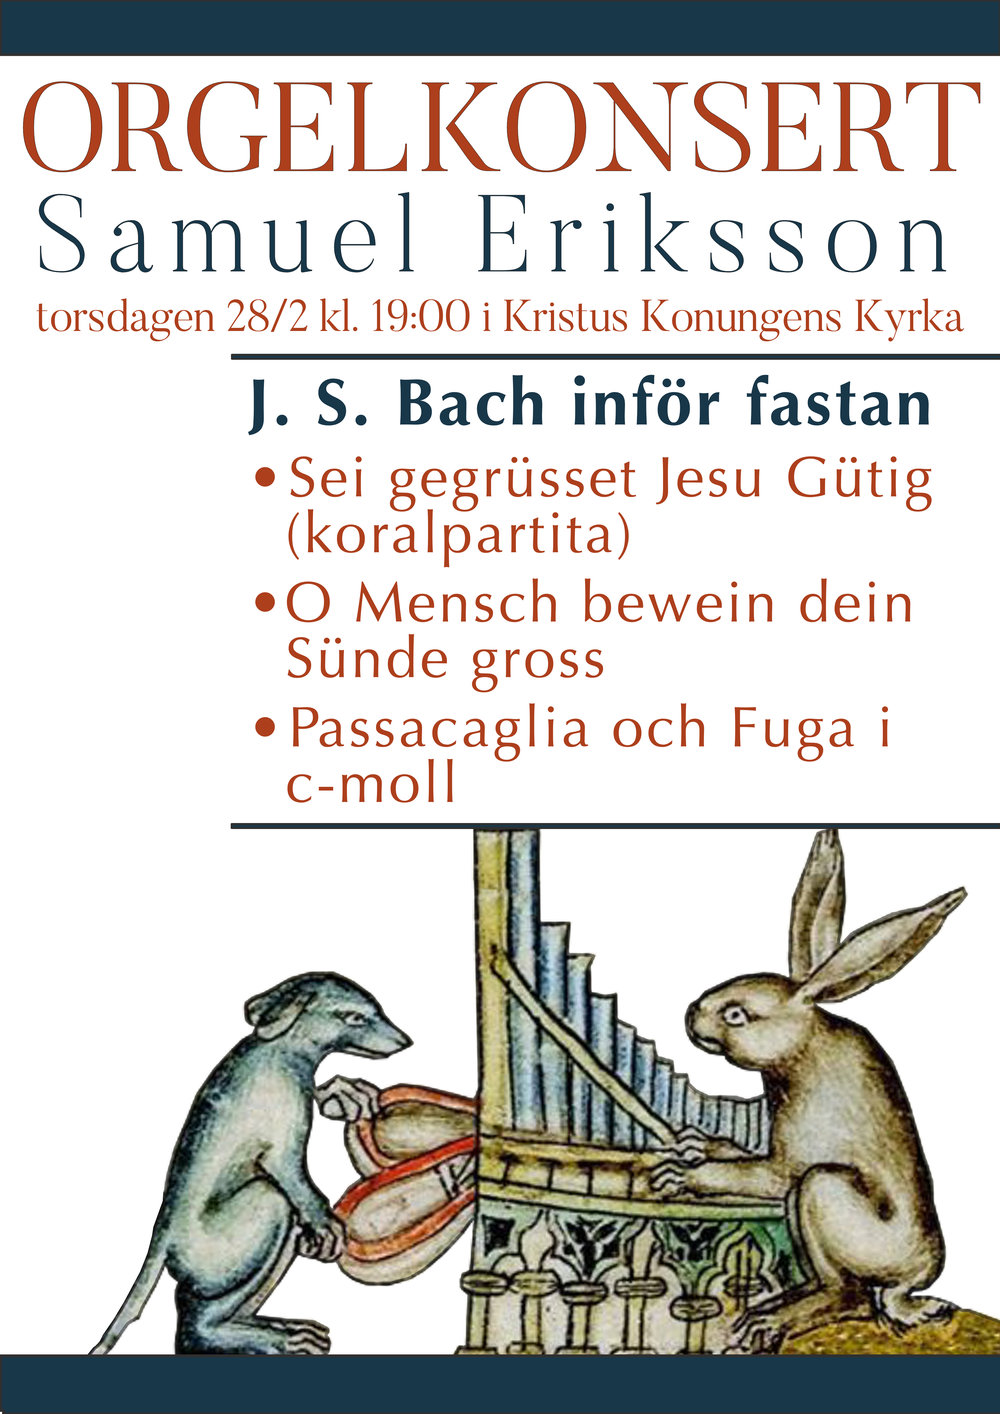 orgelkonsert affisch 4.jpg